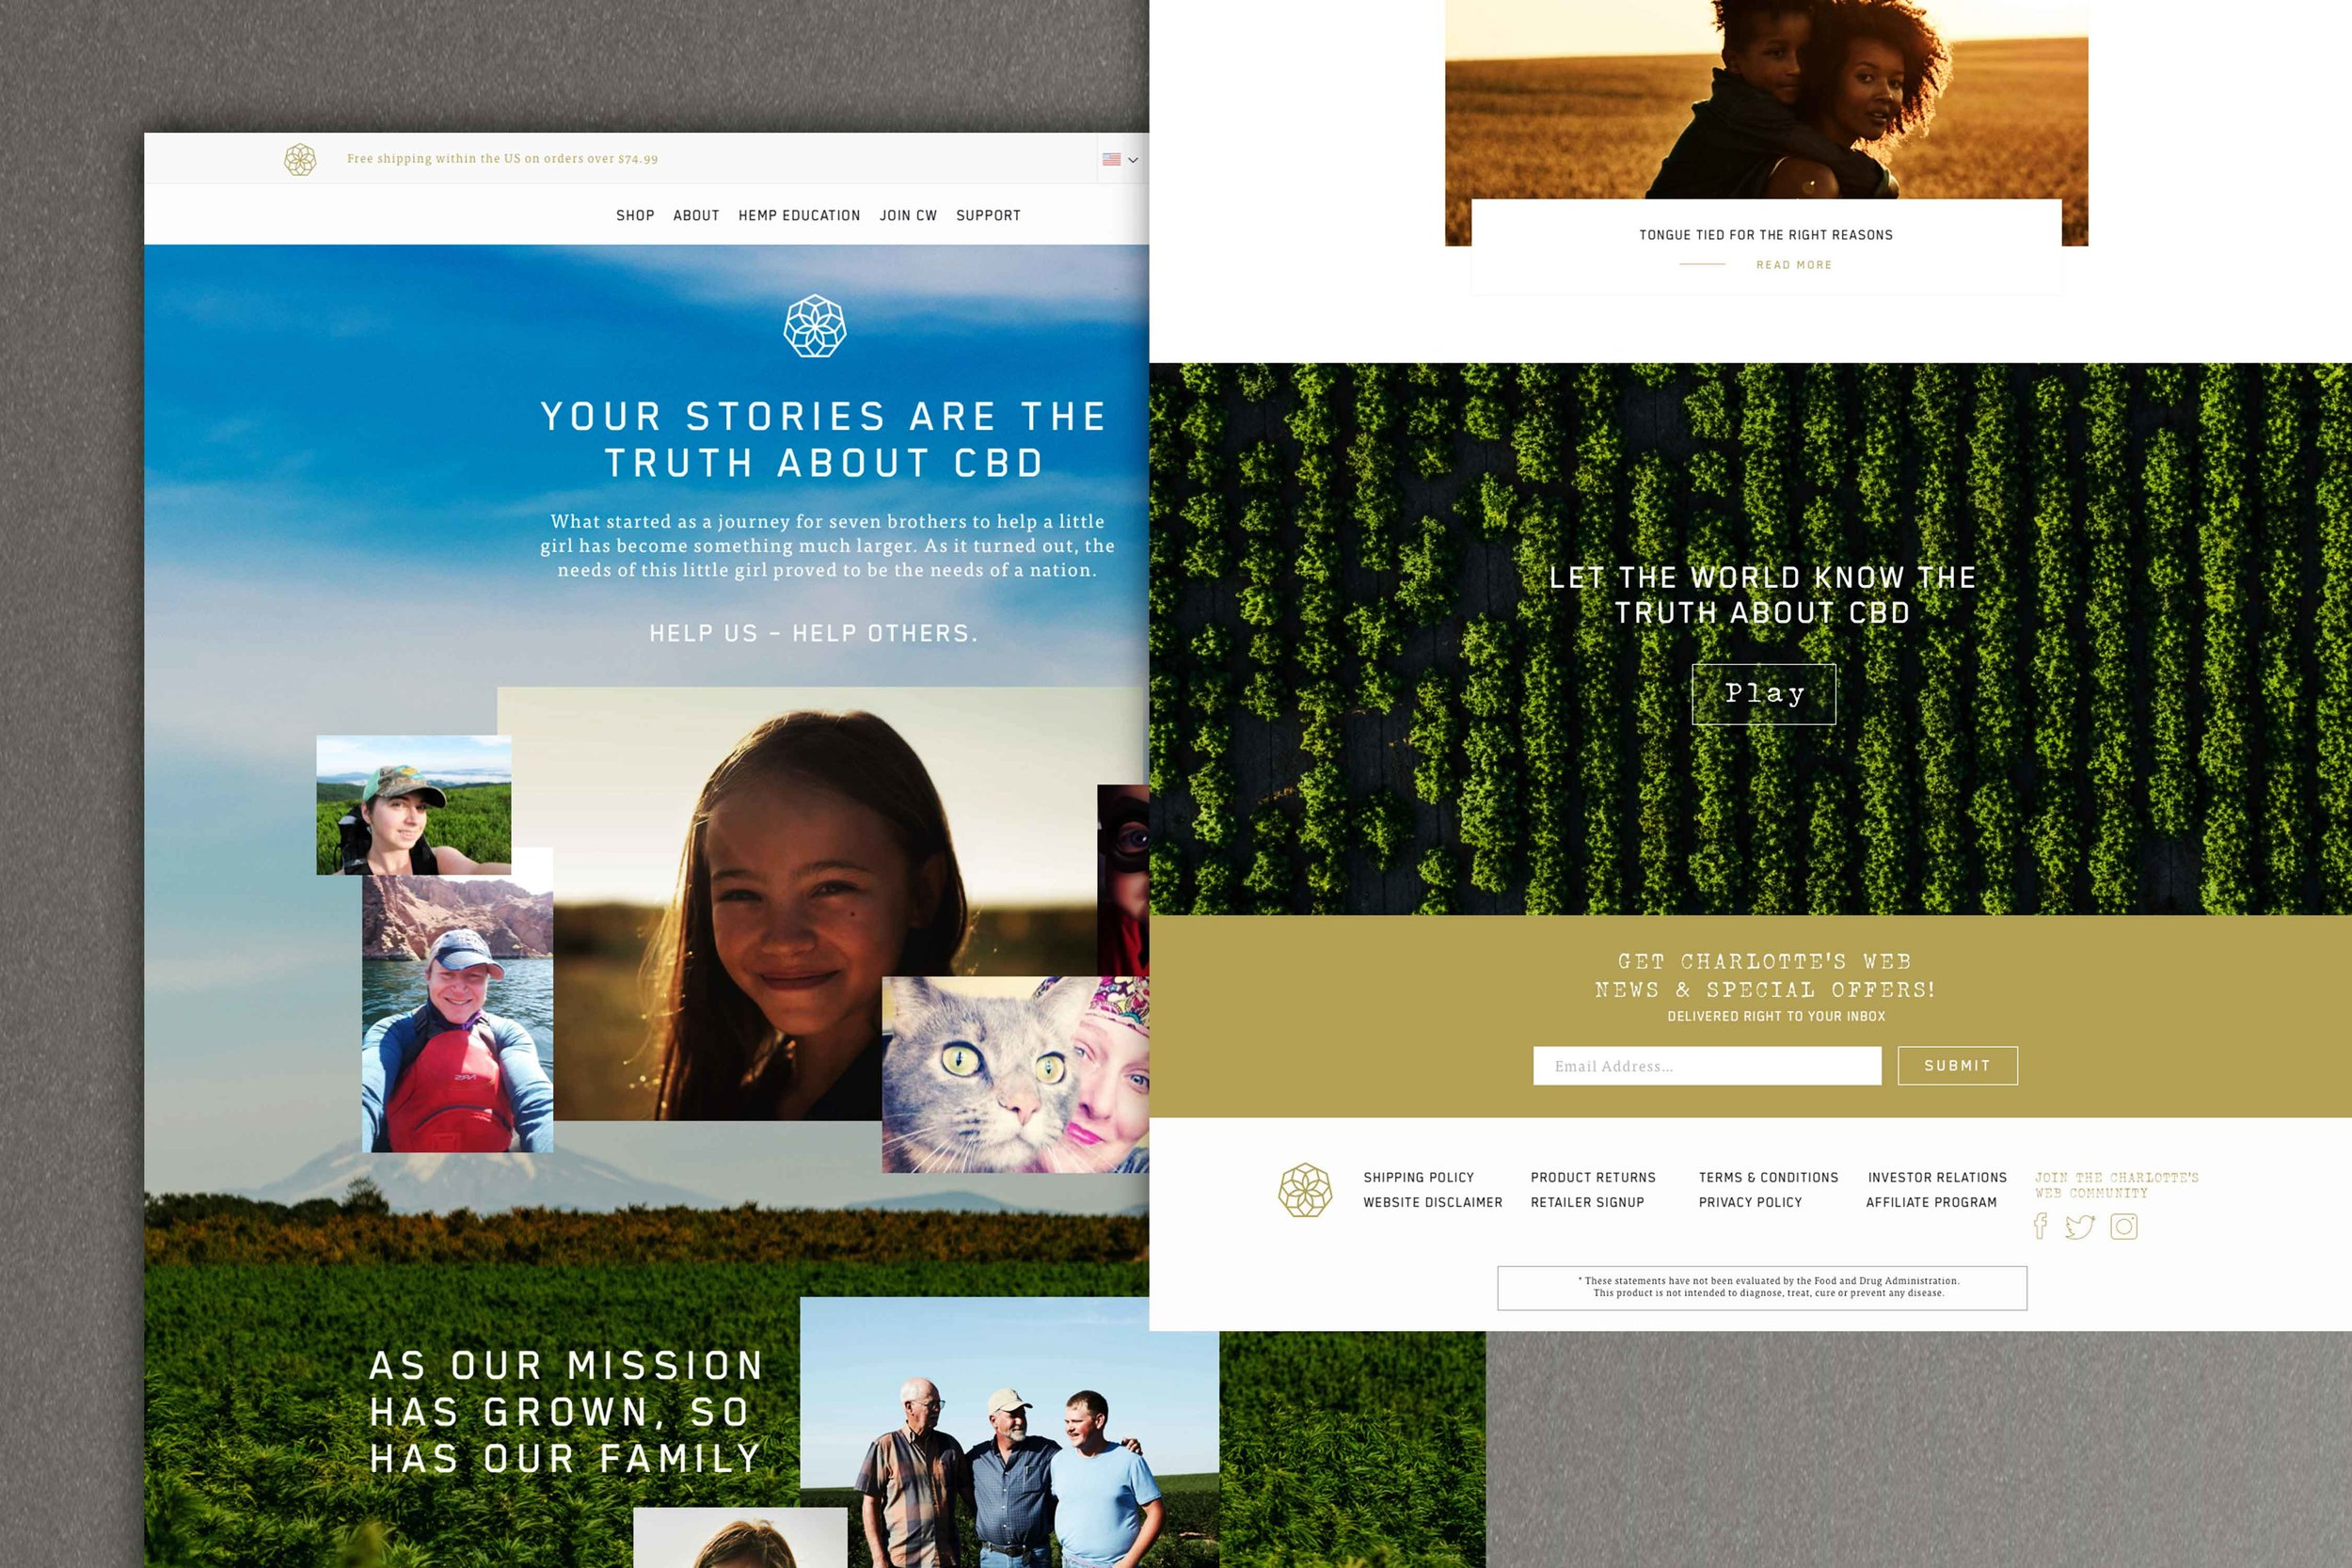 Charlottes_Web_landing_page_thumbnail.jpg